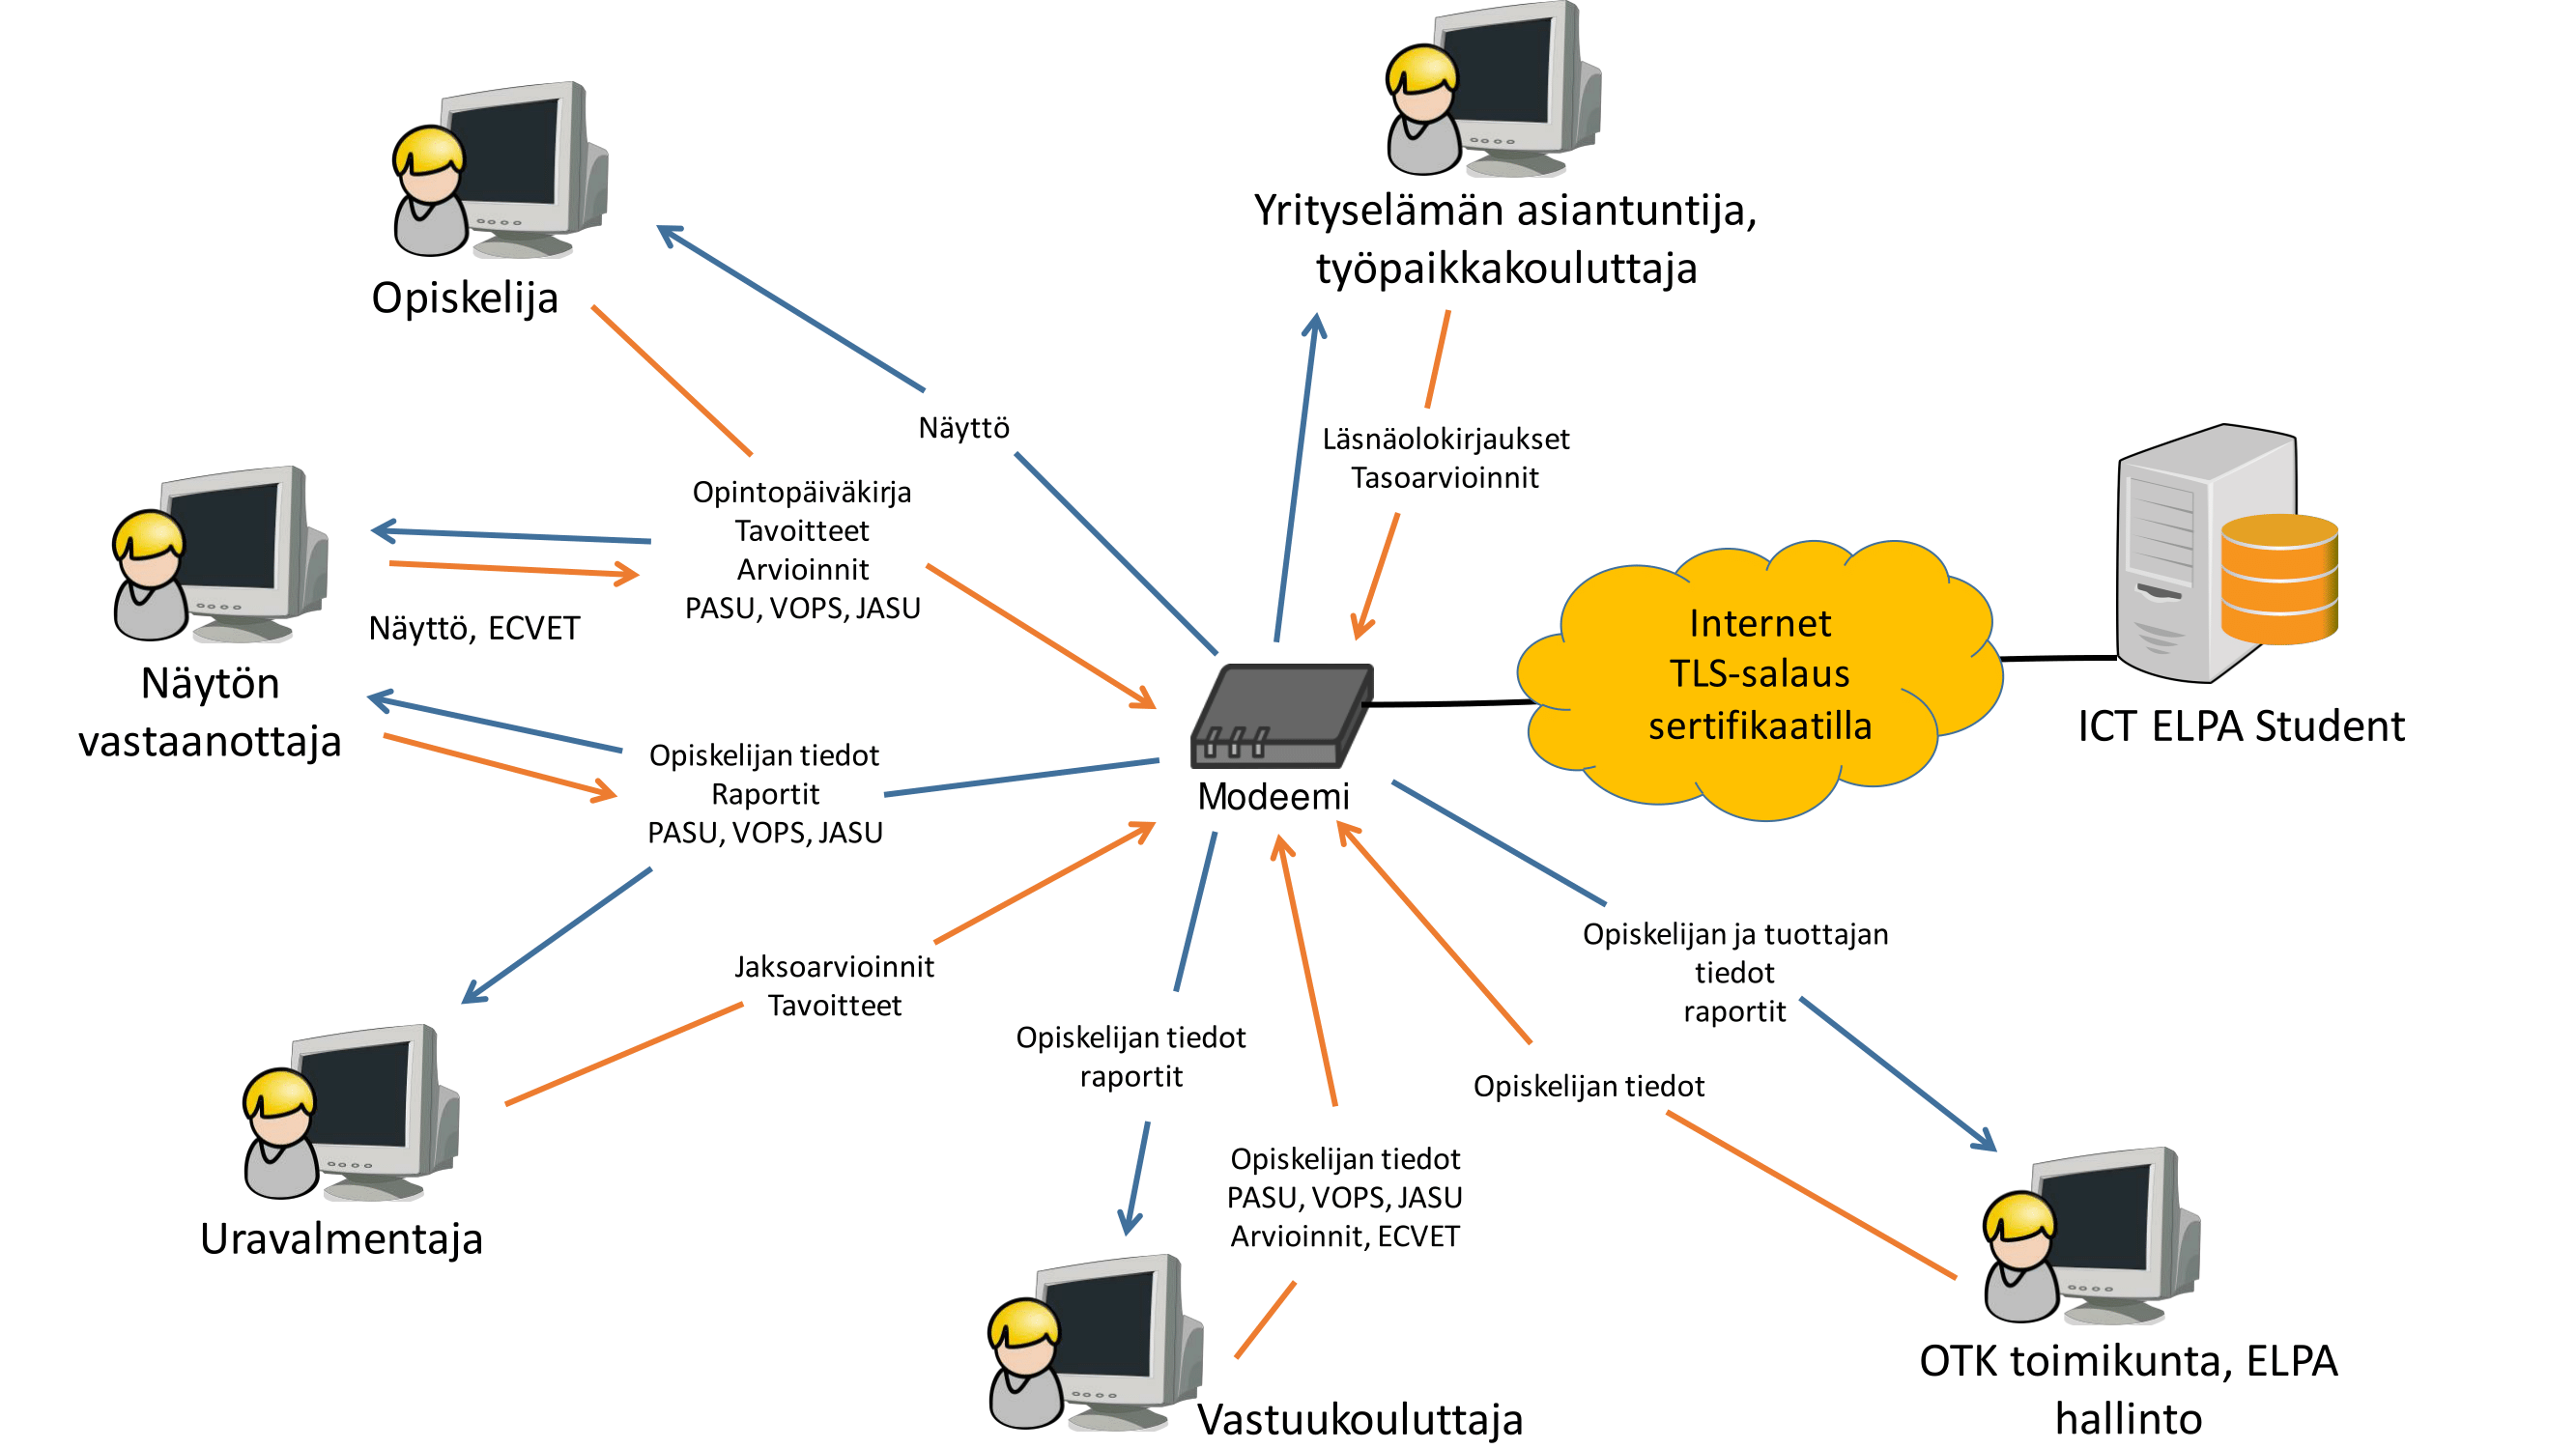 ictelpastudent-1